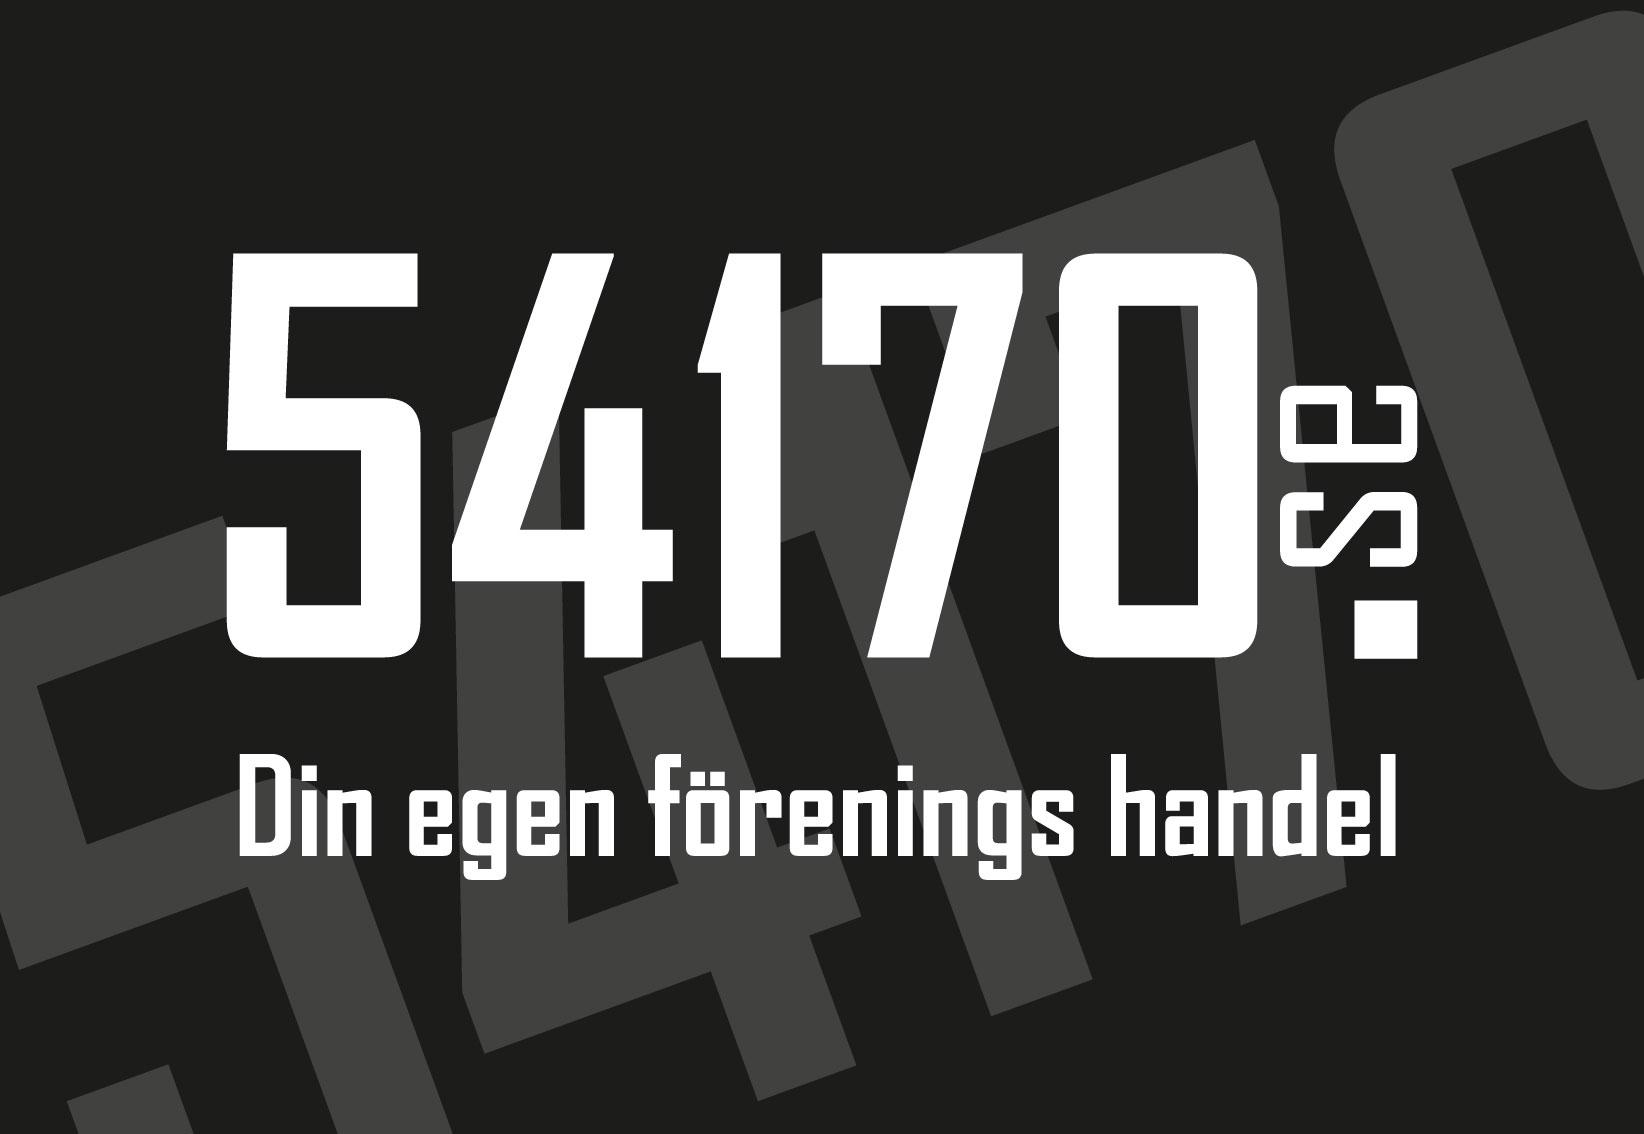 541 70